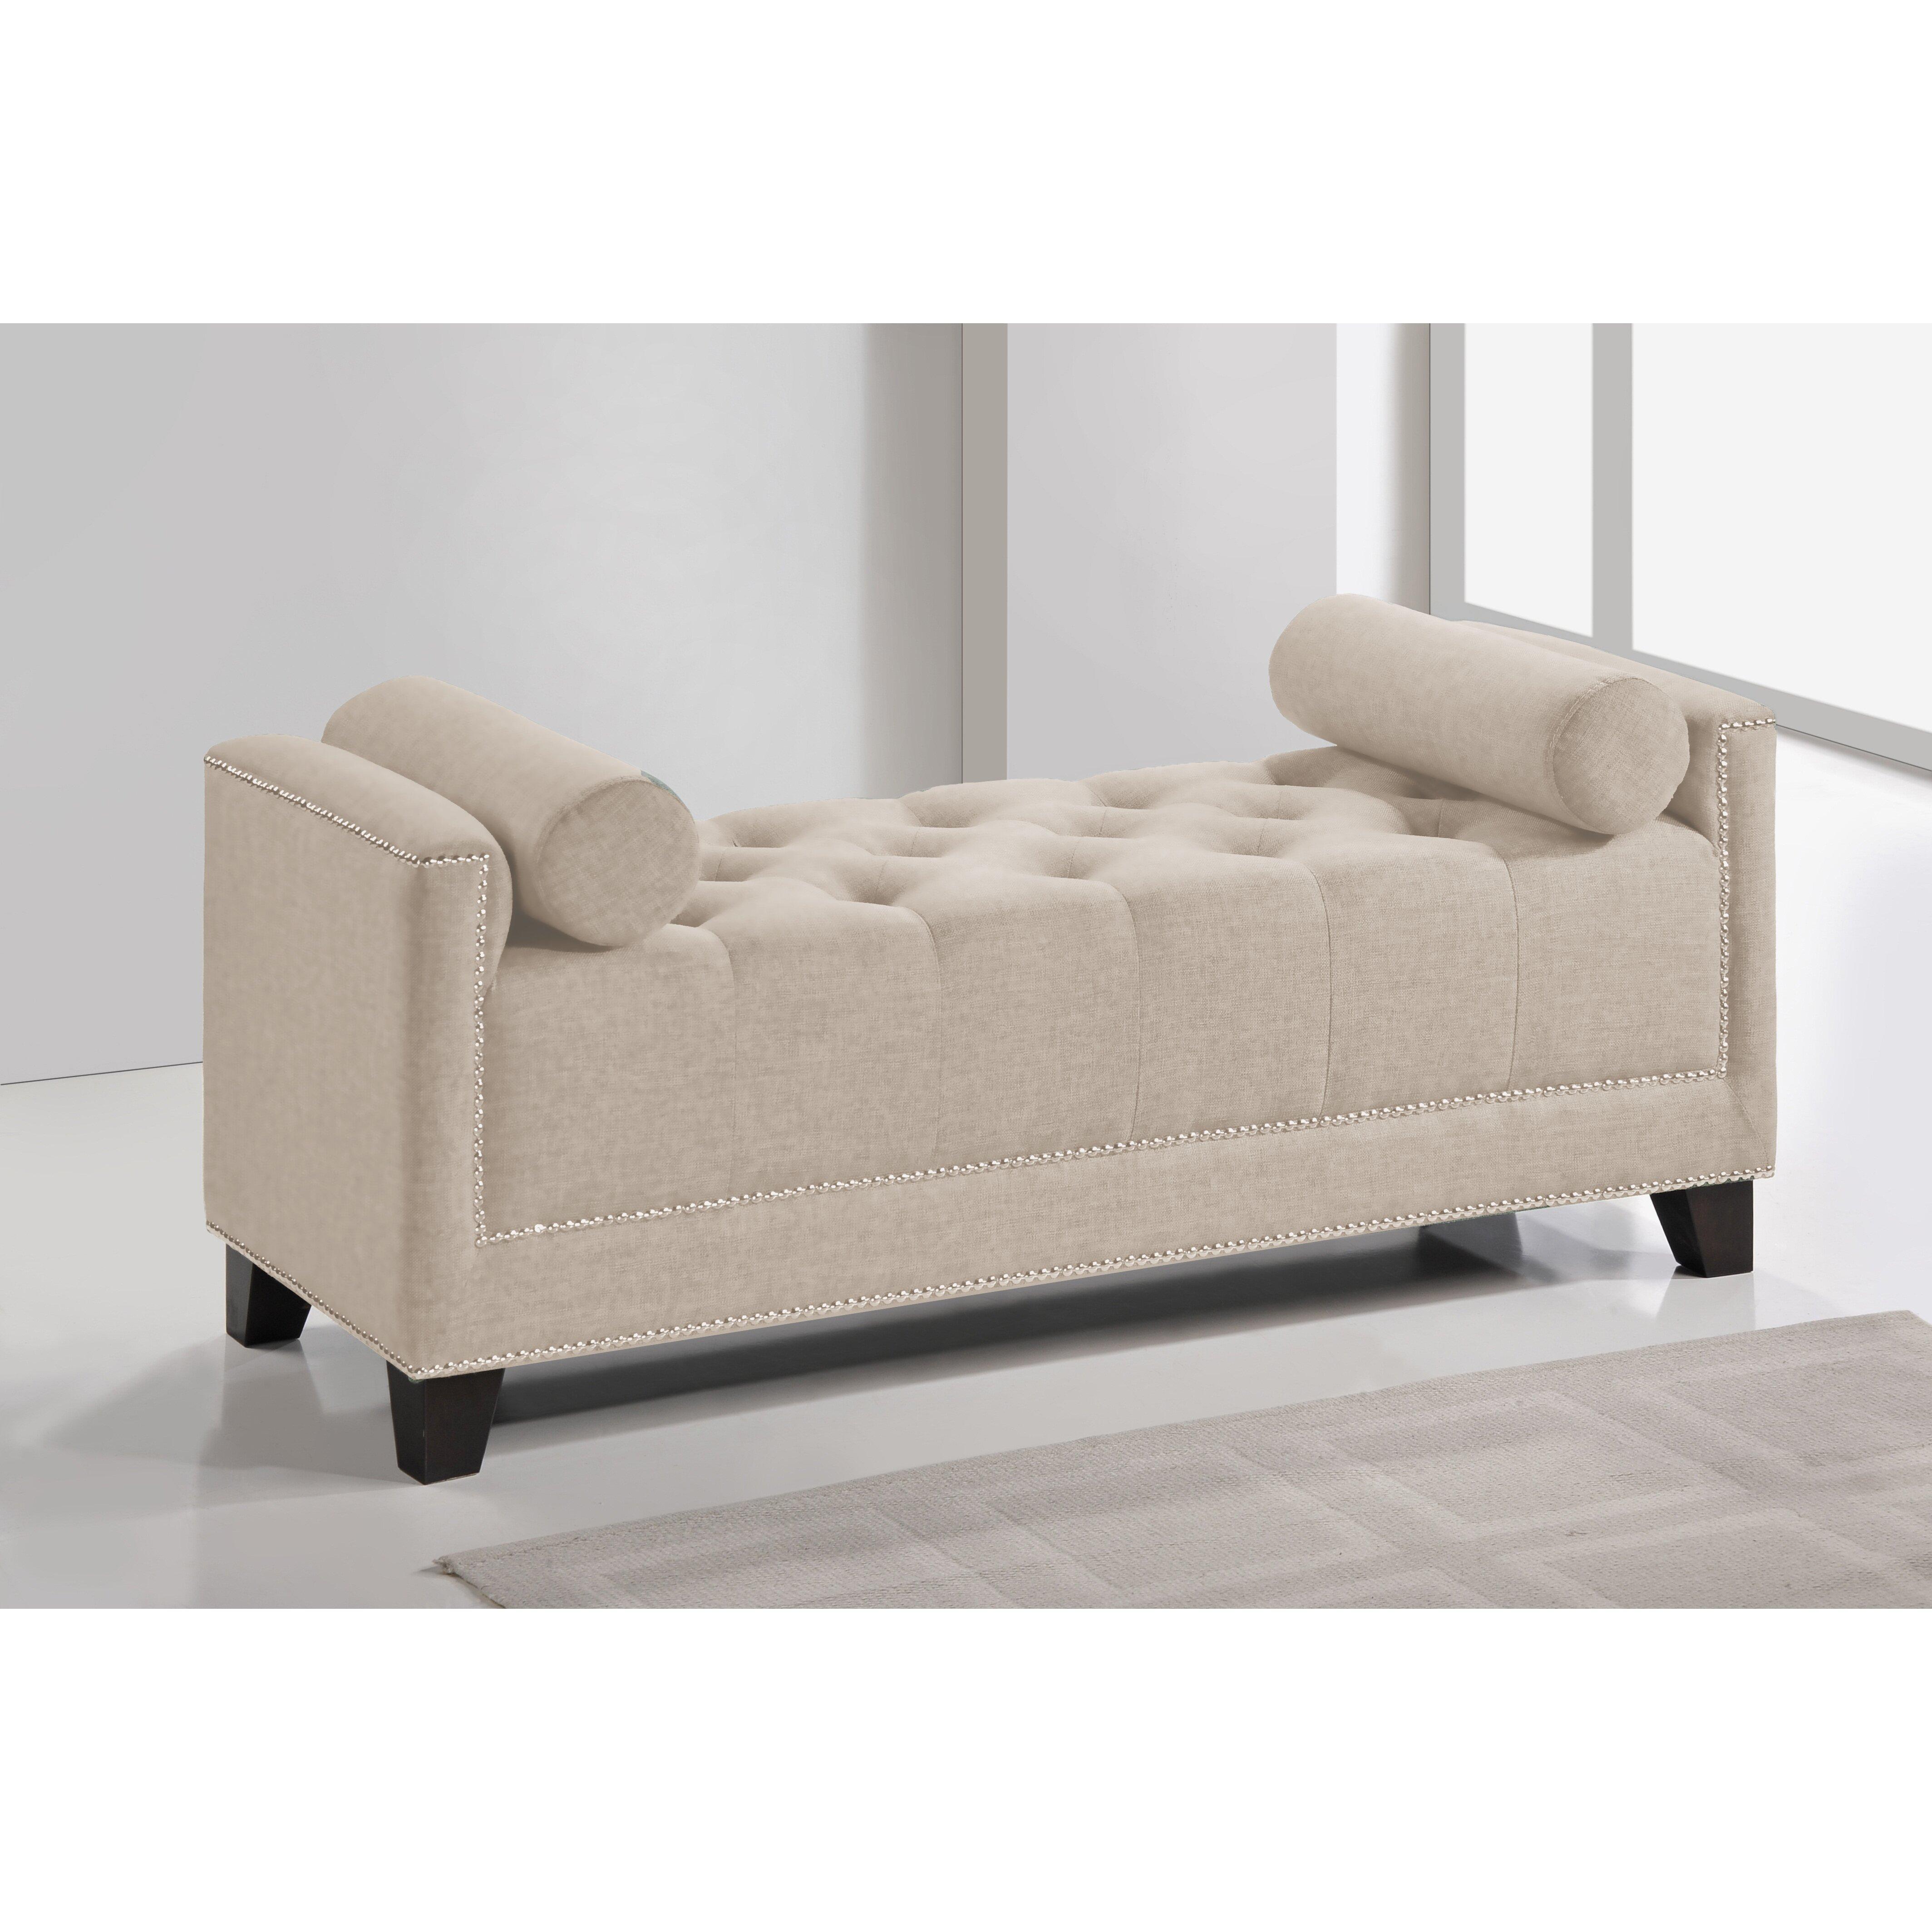 Wholesale Interiors Baxton Studio Hirst Upholstered